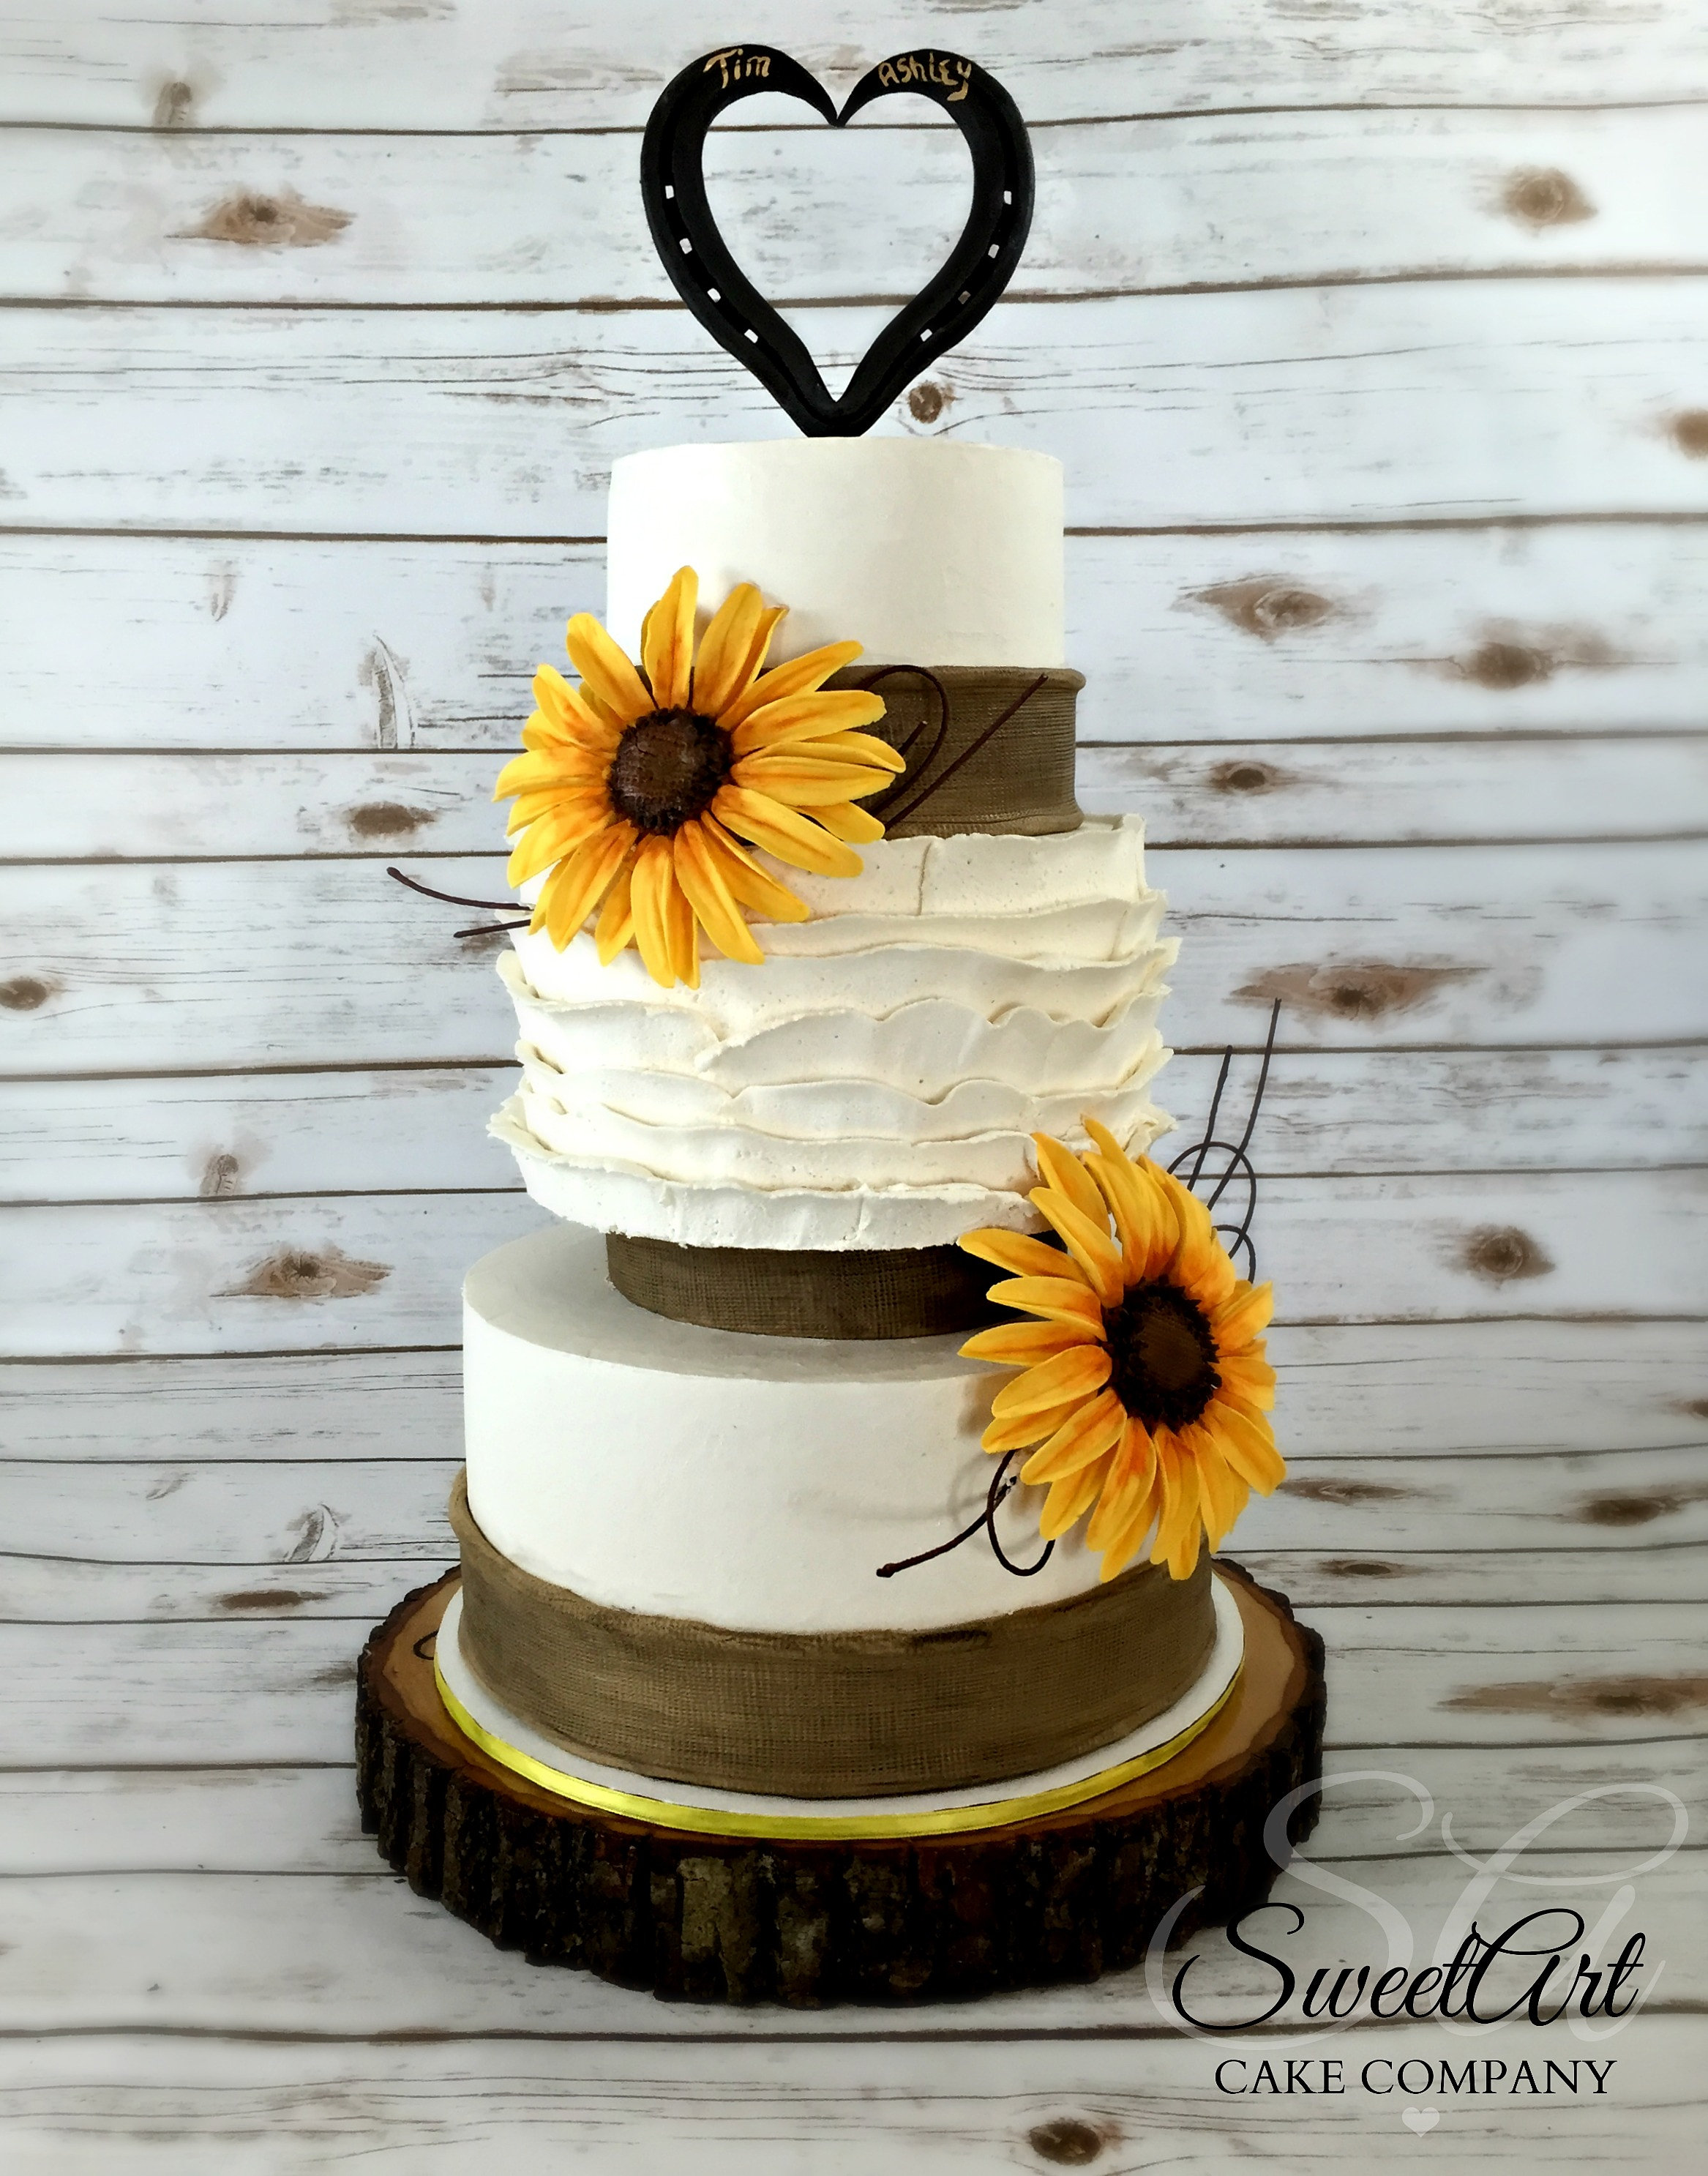 Sweet Art Cake Company Buttercream : SweetArt Cake Company-Shannon Ma Sunflower Fall Wedding Cake